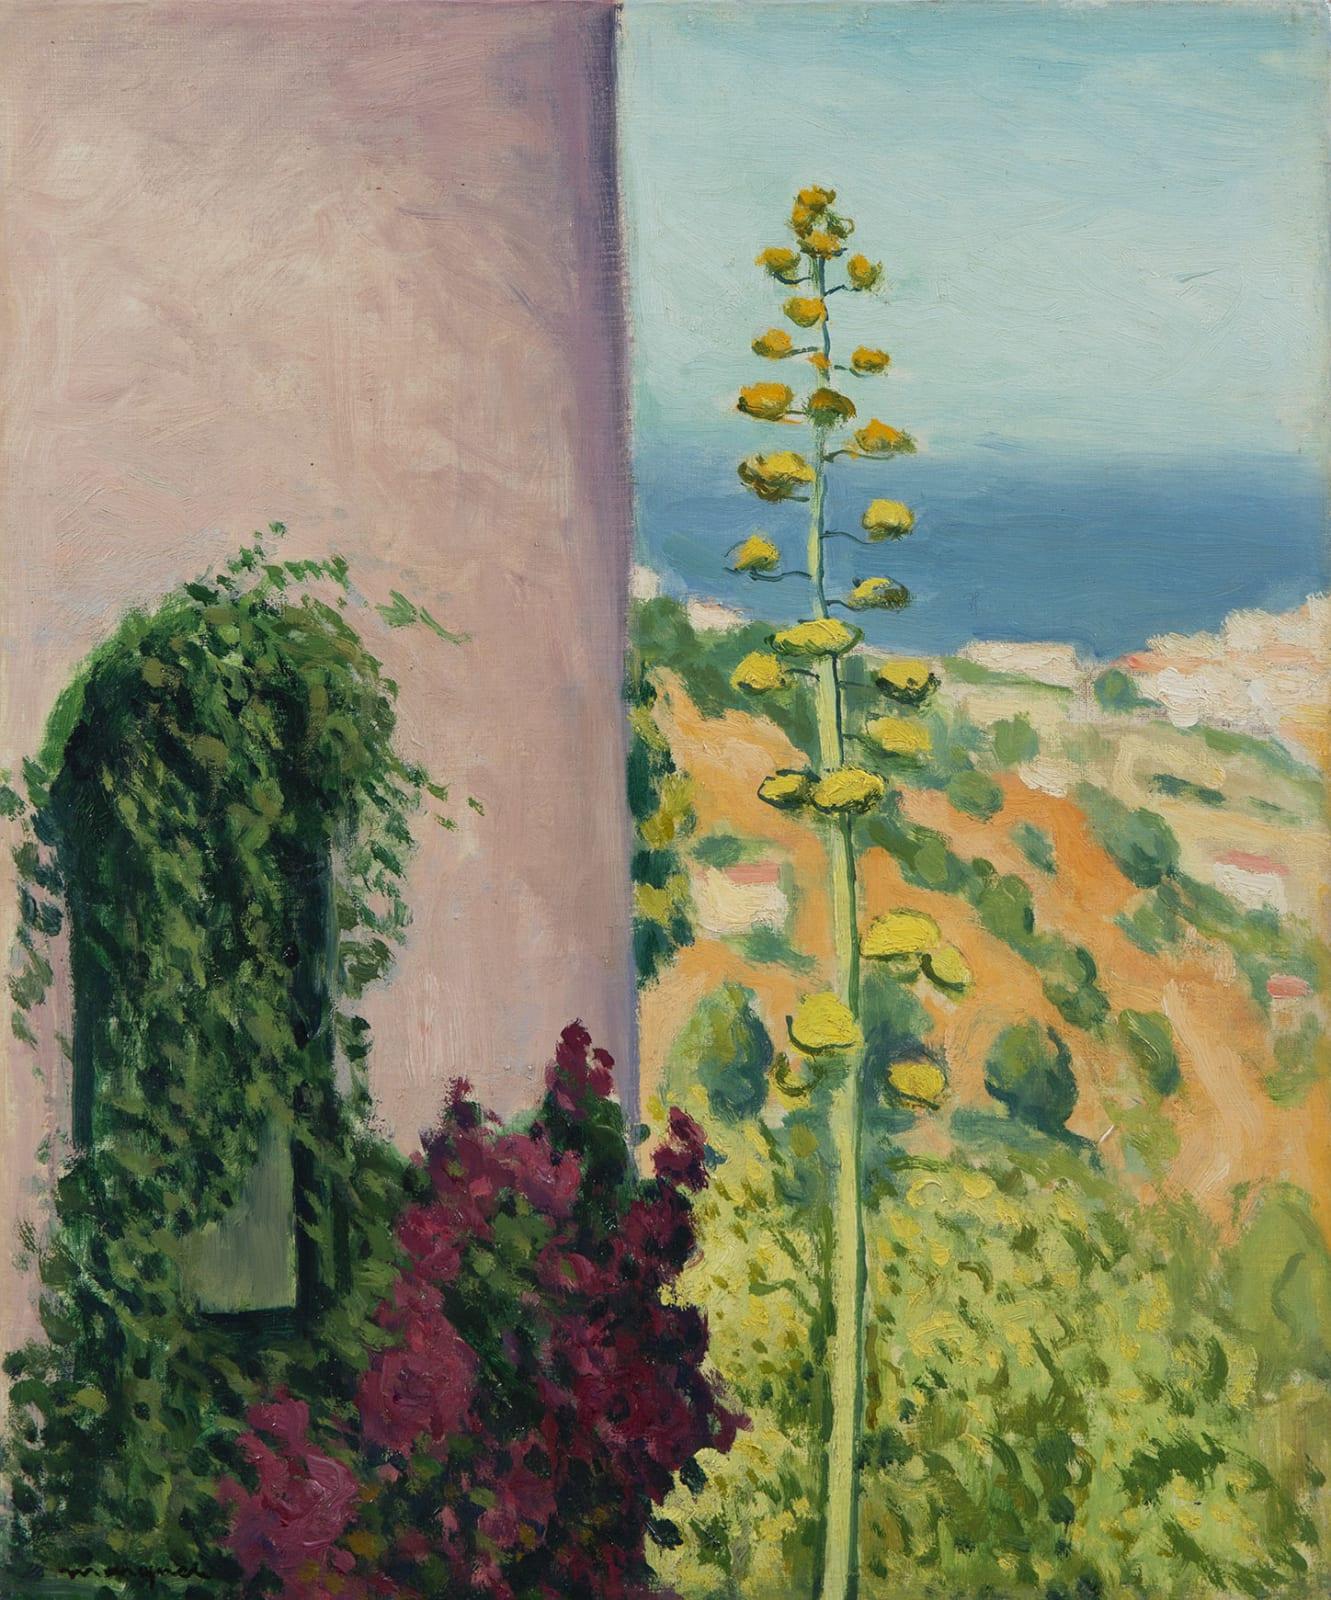 ALBERT MARQUET, Aloes fleuri, 1944